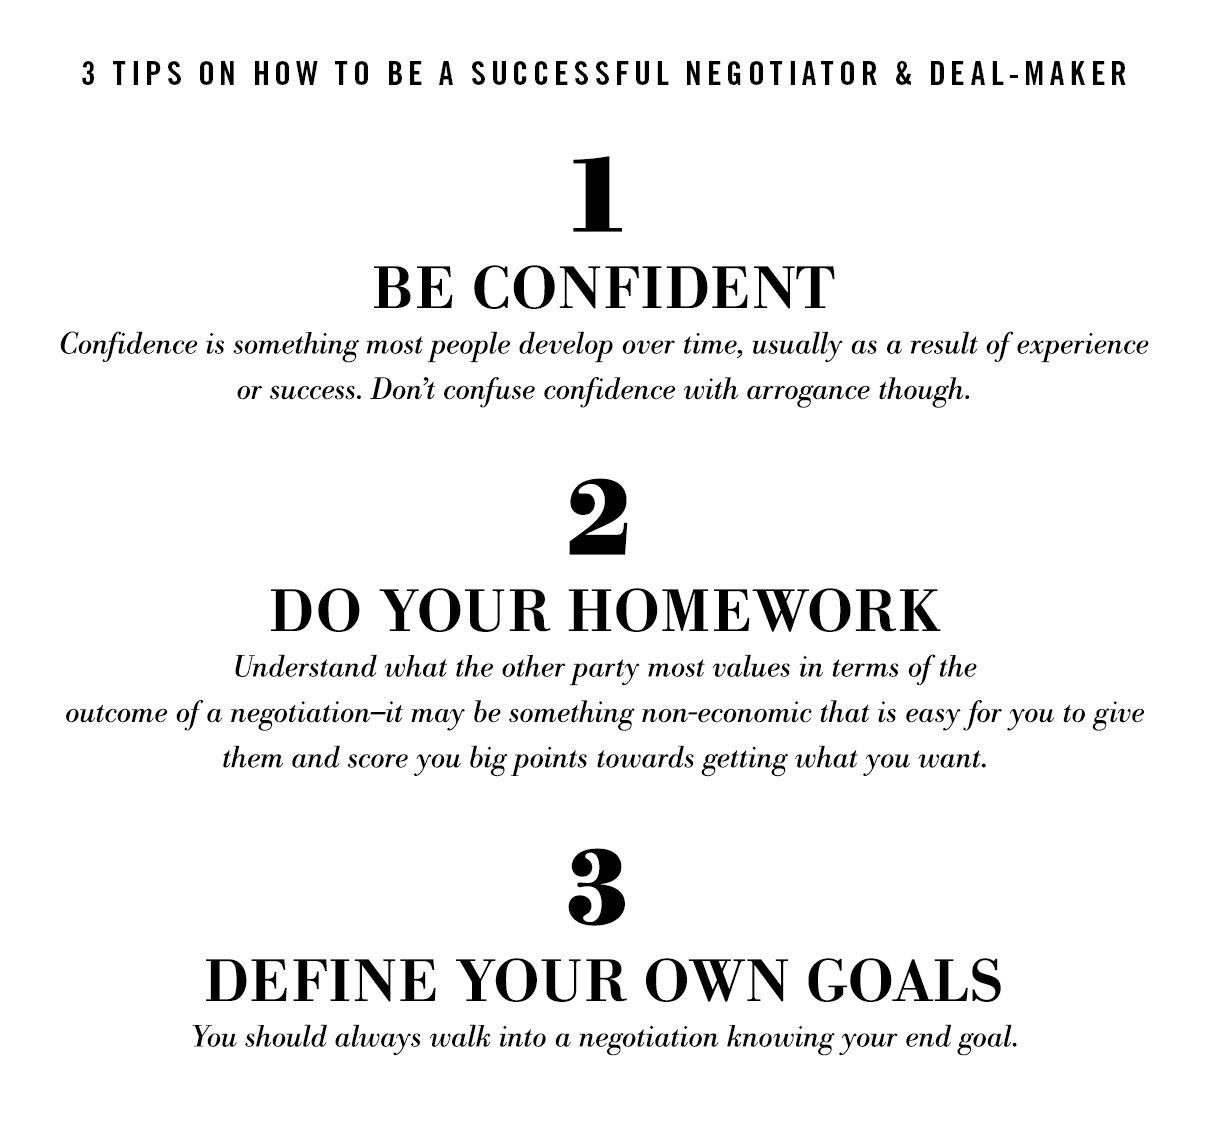 theartofivankatrump: 3 tips on how to be a successful negotiator & dealmaker